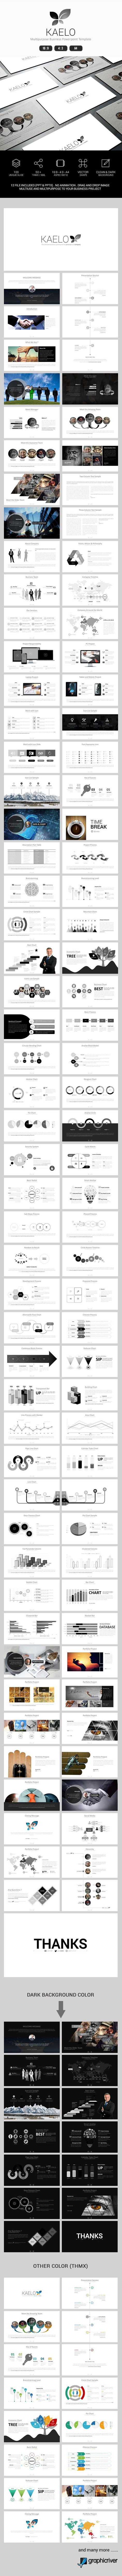 Kaelo Powerpoint Template  #agency #biz • Download ➝ https://graphicriver.net/item/kaelo-powerpoint-template/18355543?ref=pxcr